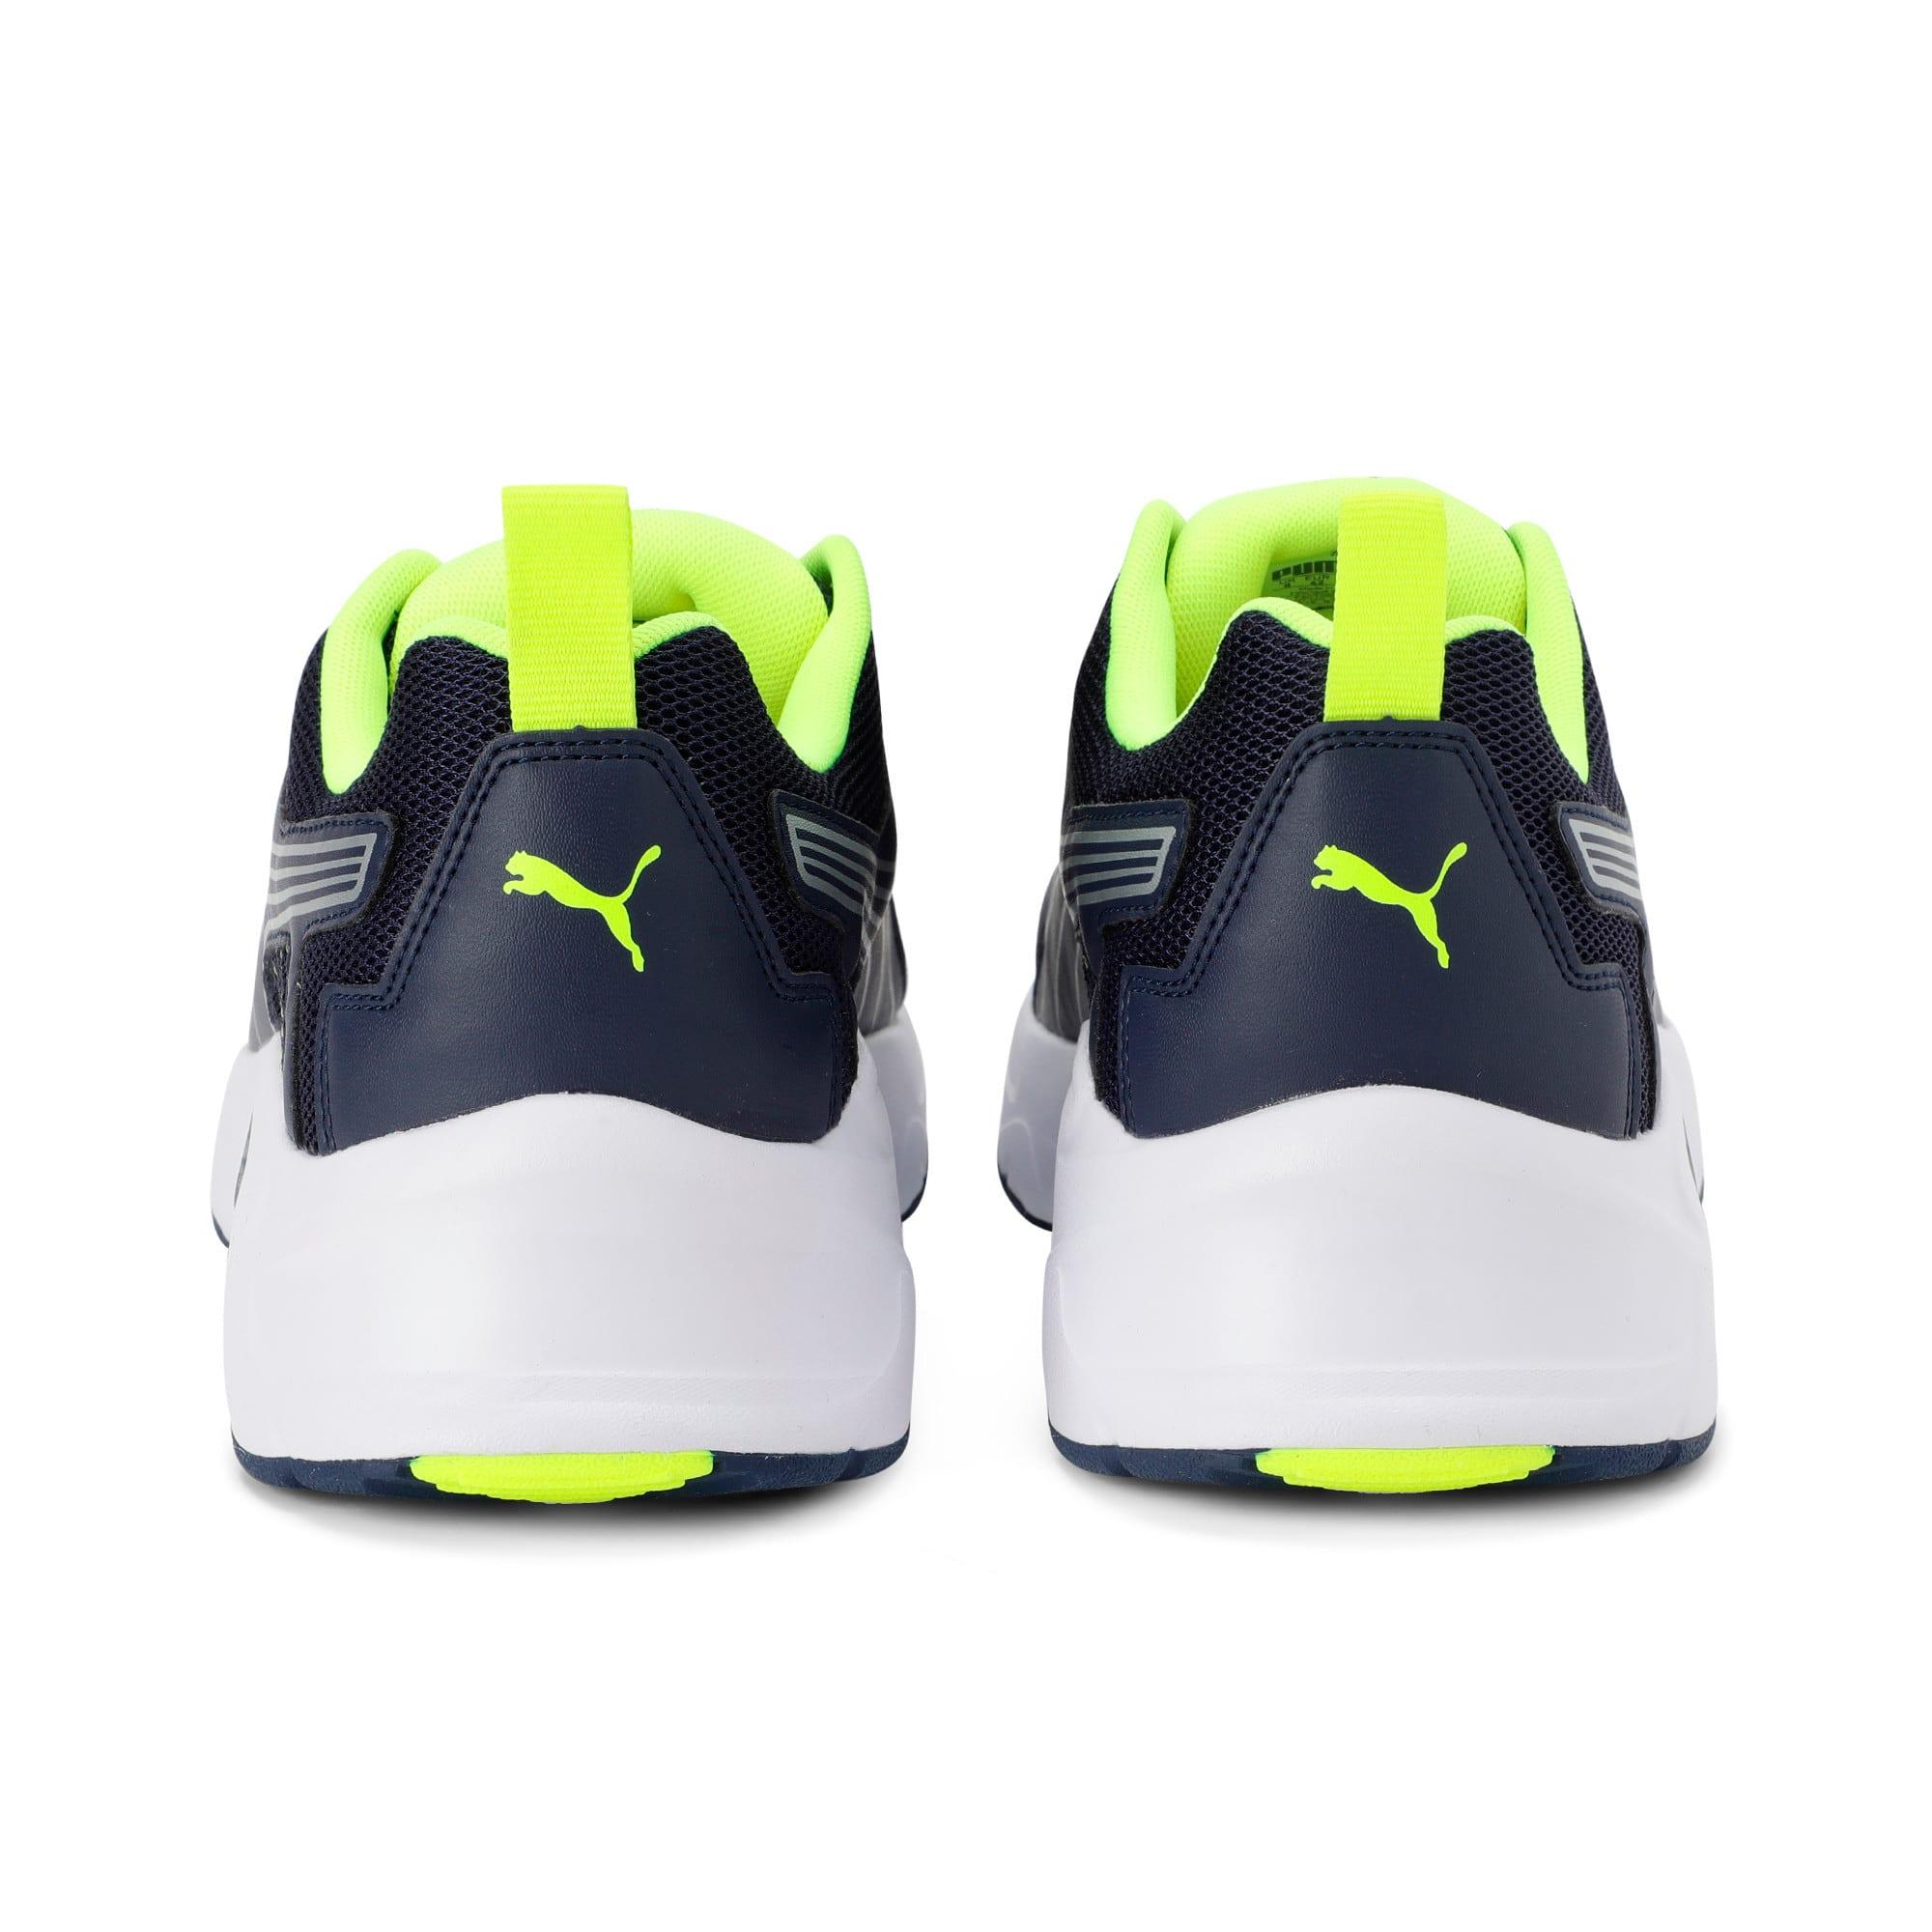 Thumbnail 5 of Nucleus Run Training Shoes, Peacoat-Puma Silver, medium-IND